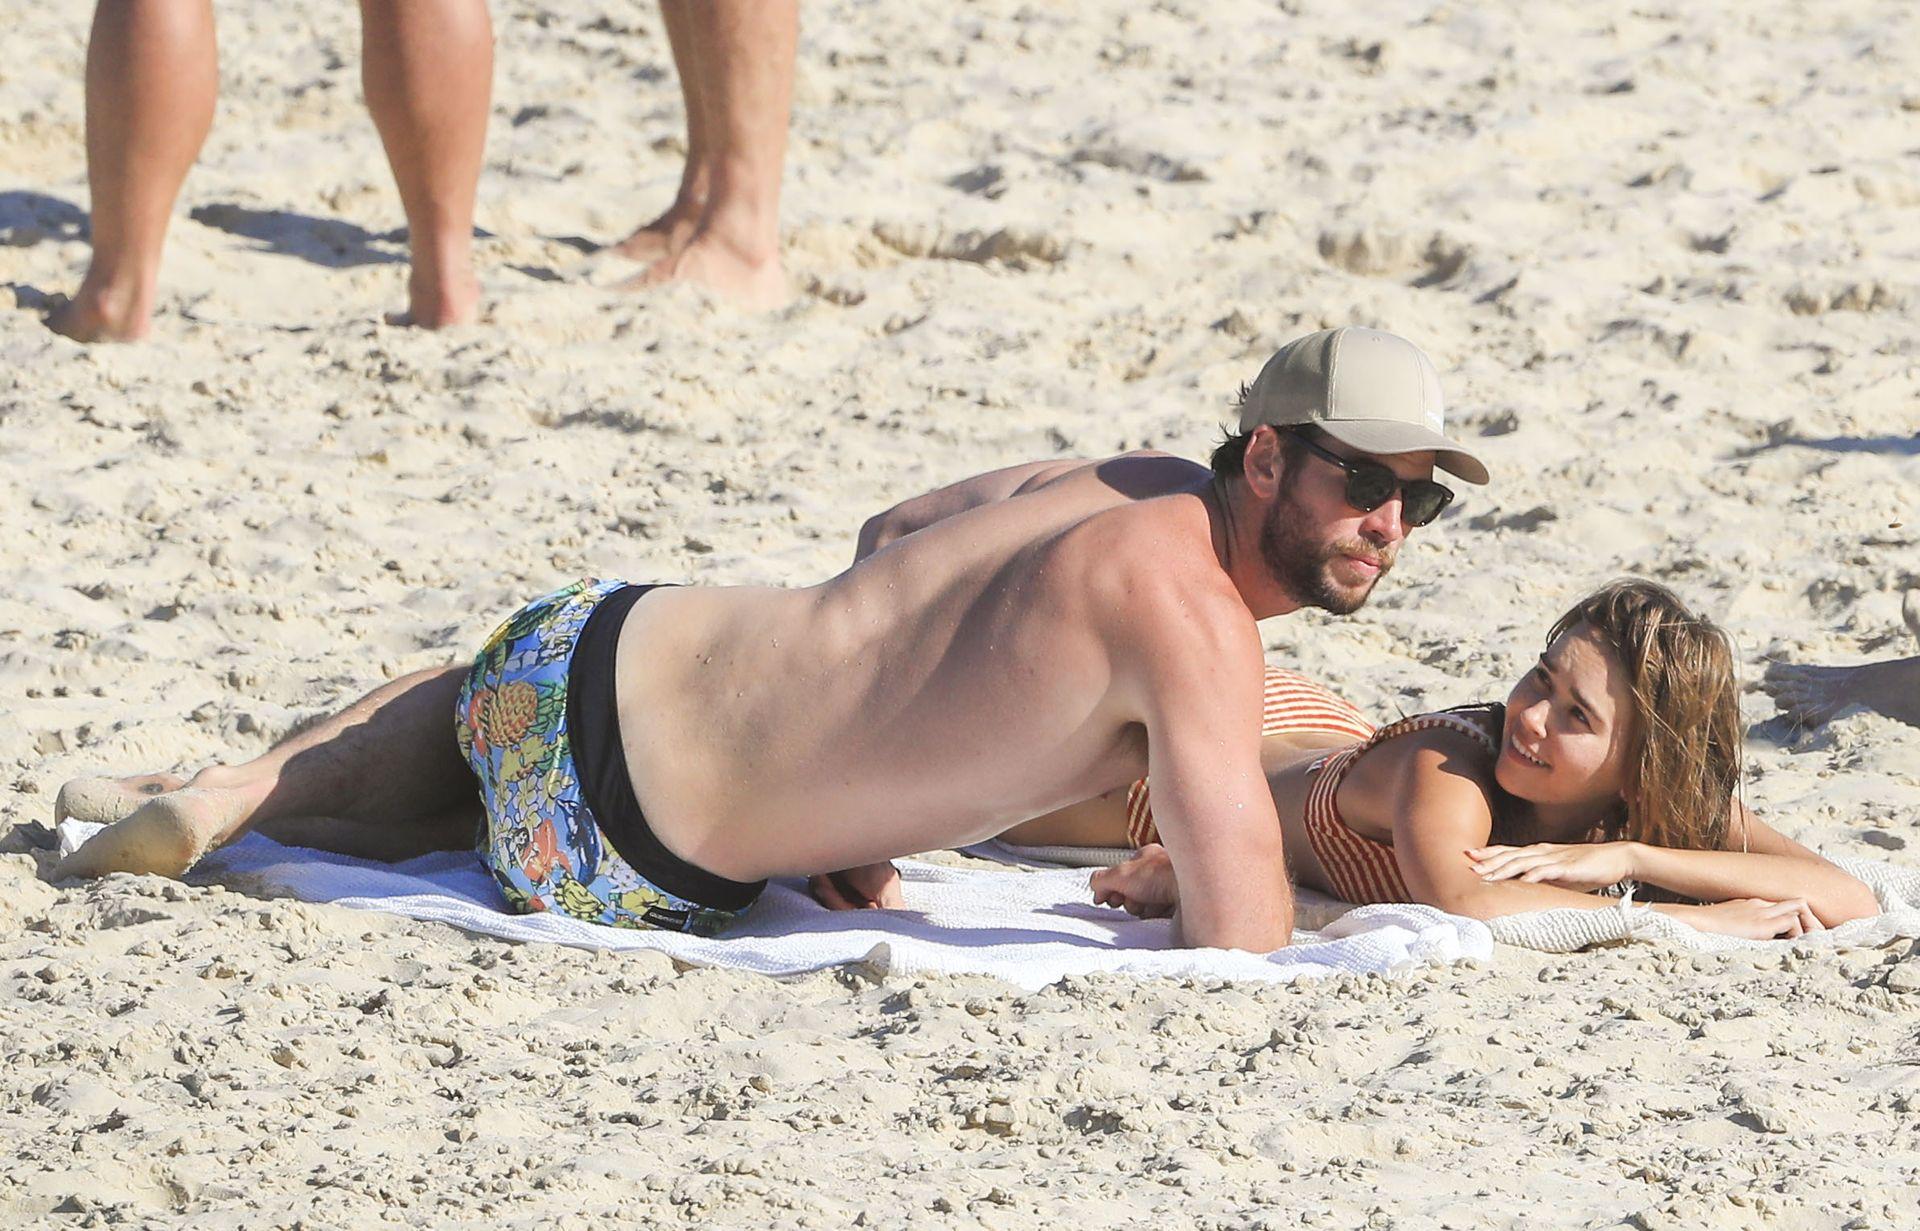 Gabriella Brooks Hot – Liam Hemsworth's New Girlfriend 0017